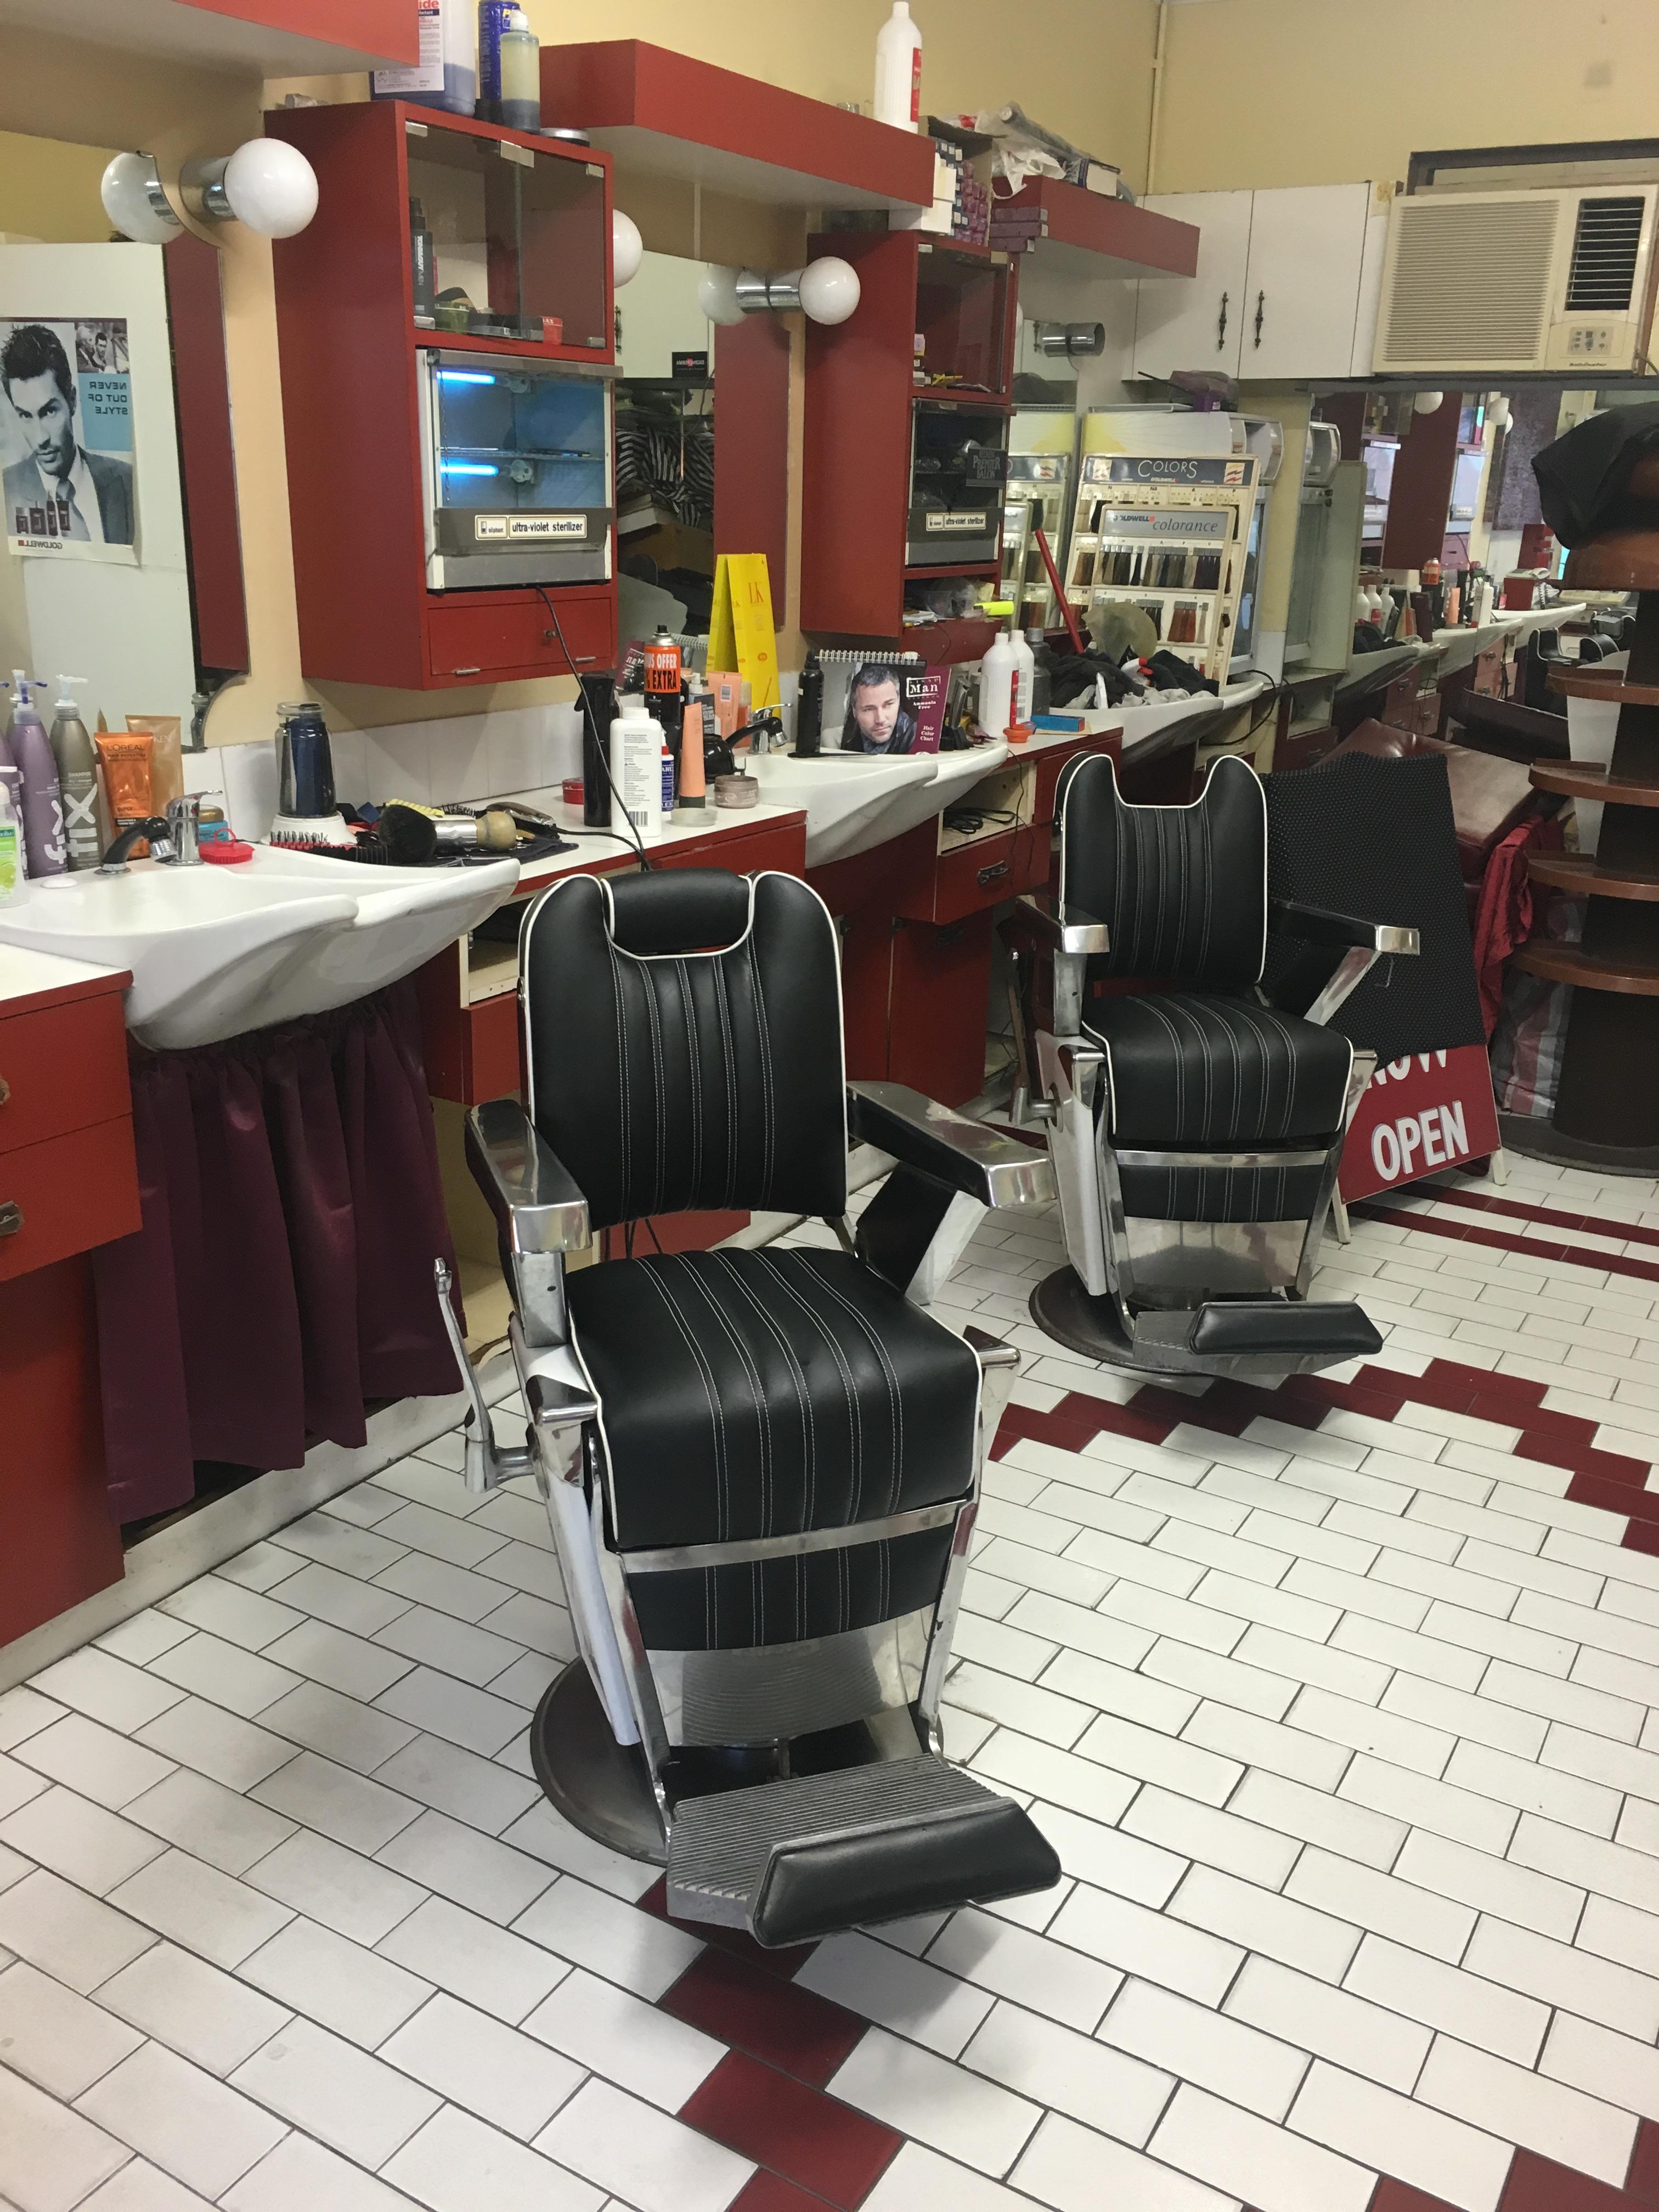 Franco s Barber shop